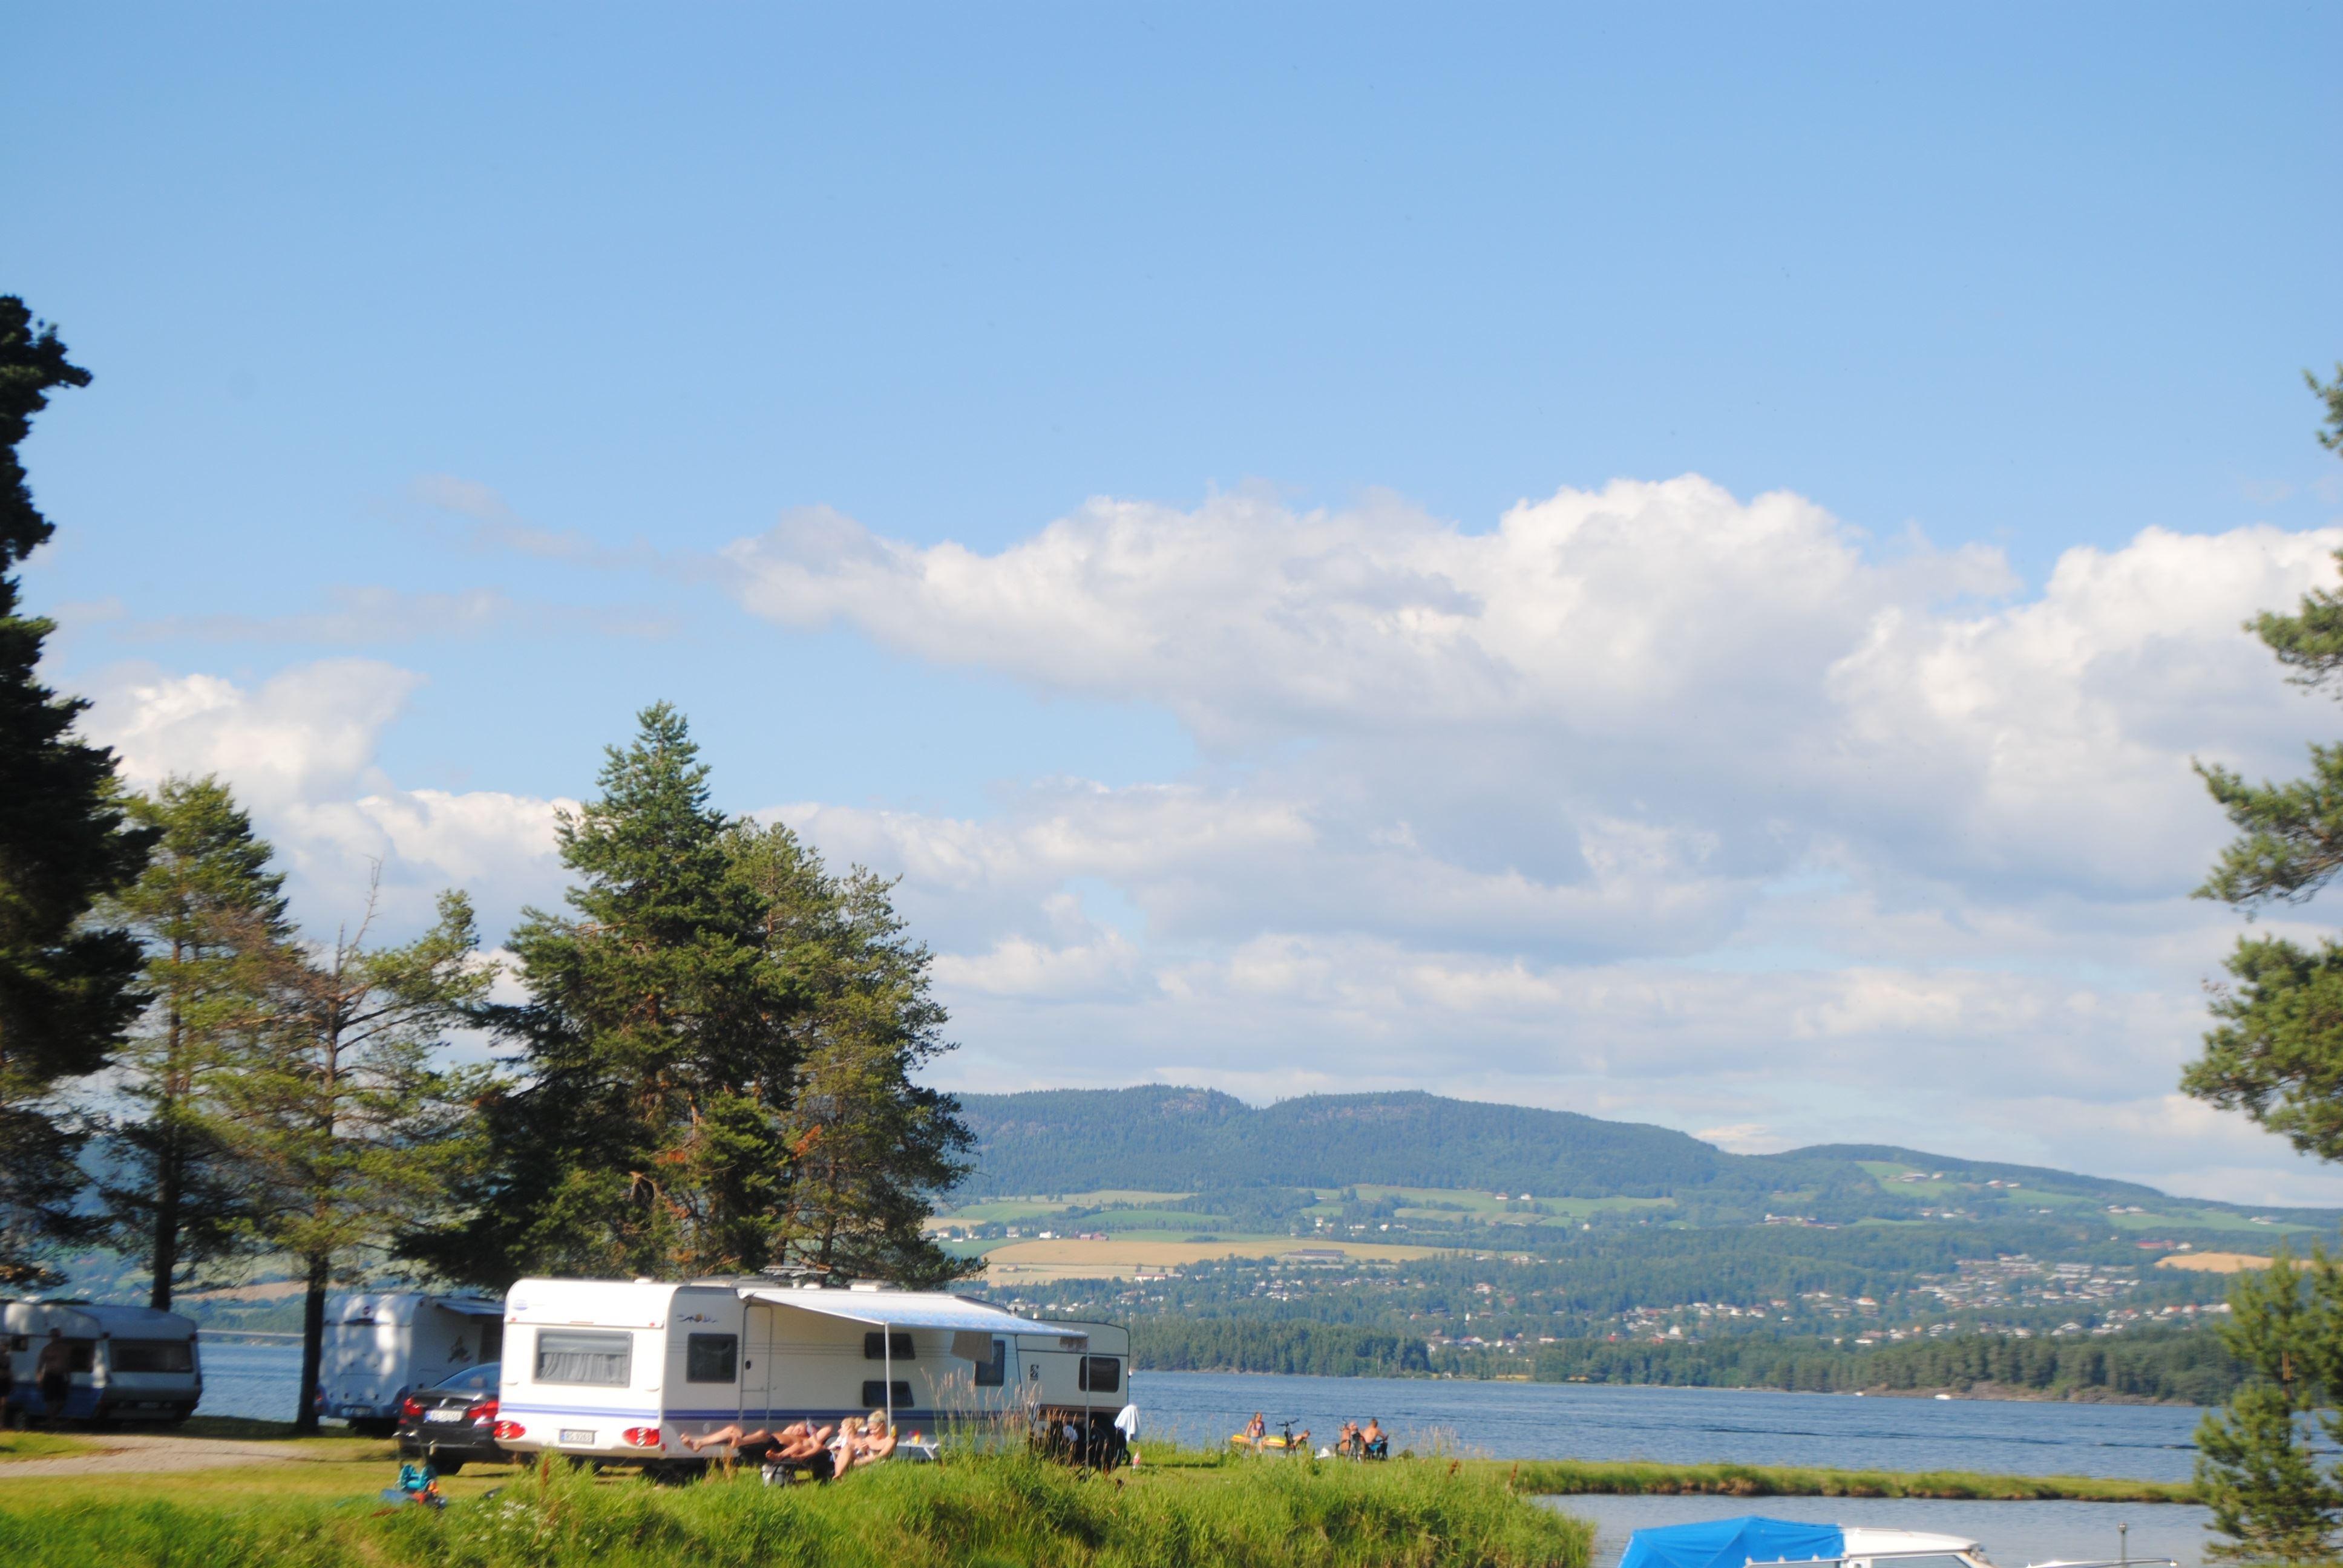 Sveastranda Camping cabins